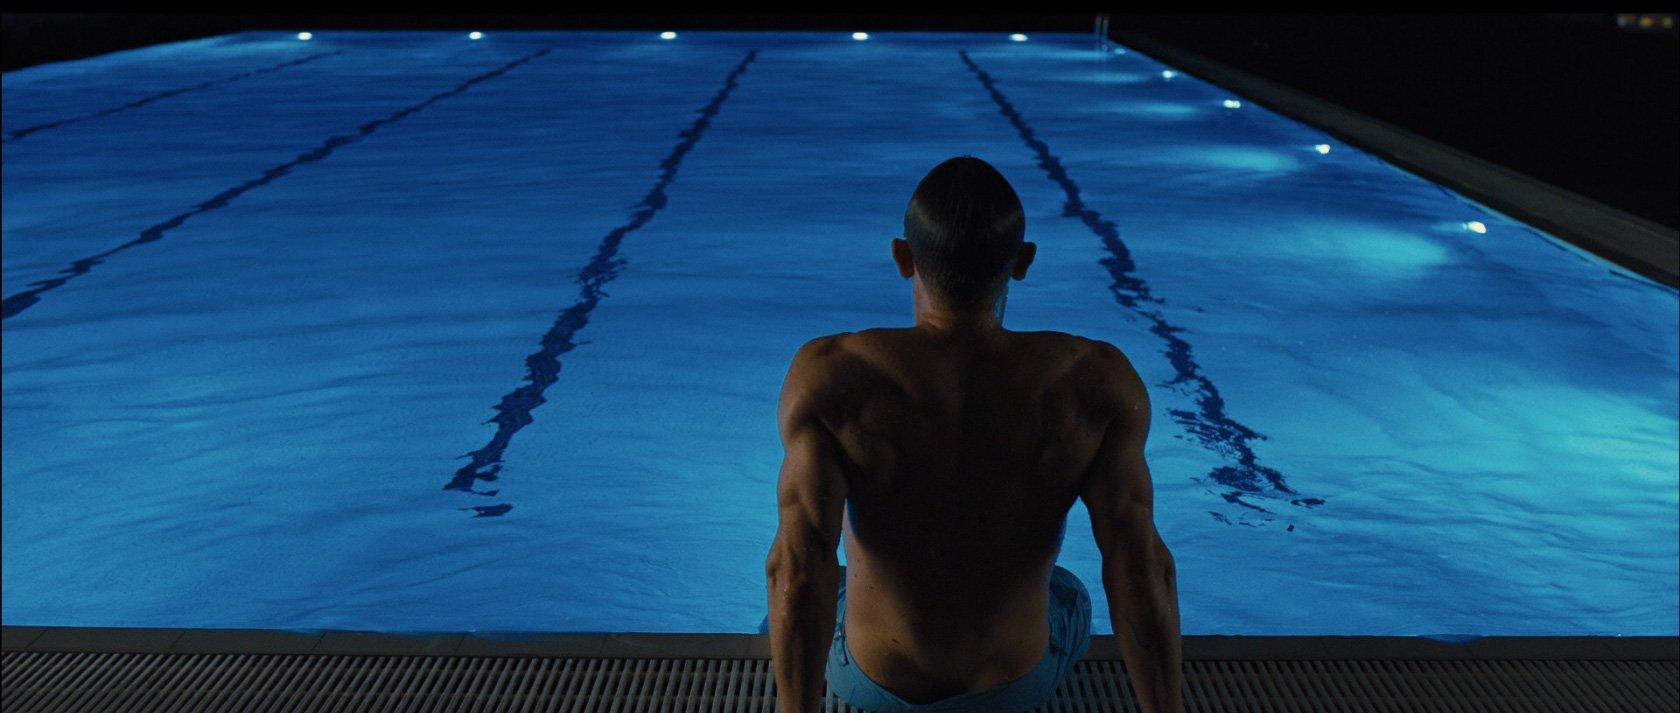 http://www.bondsuits.com/wp-content/uploads/2013/08/Orlebar-Brown-Swimming-Trunks.jpg